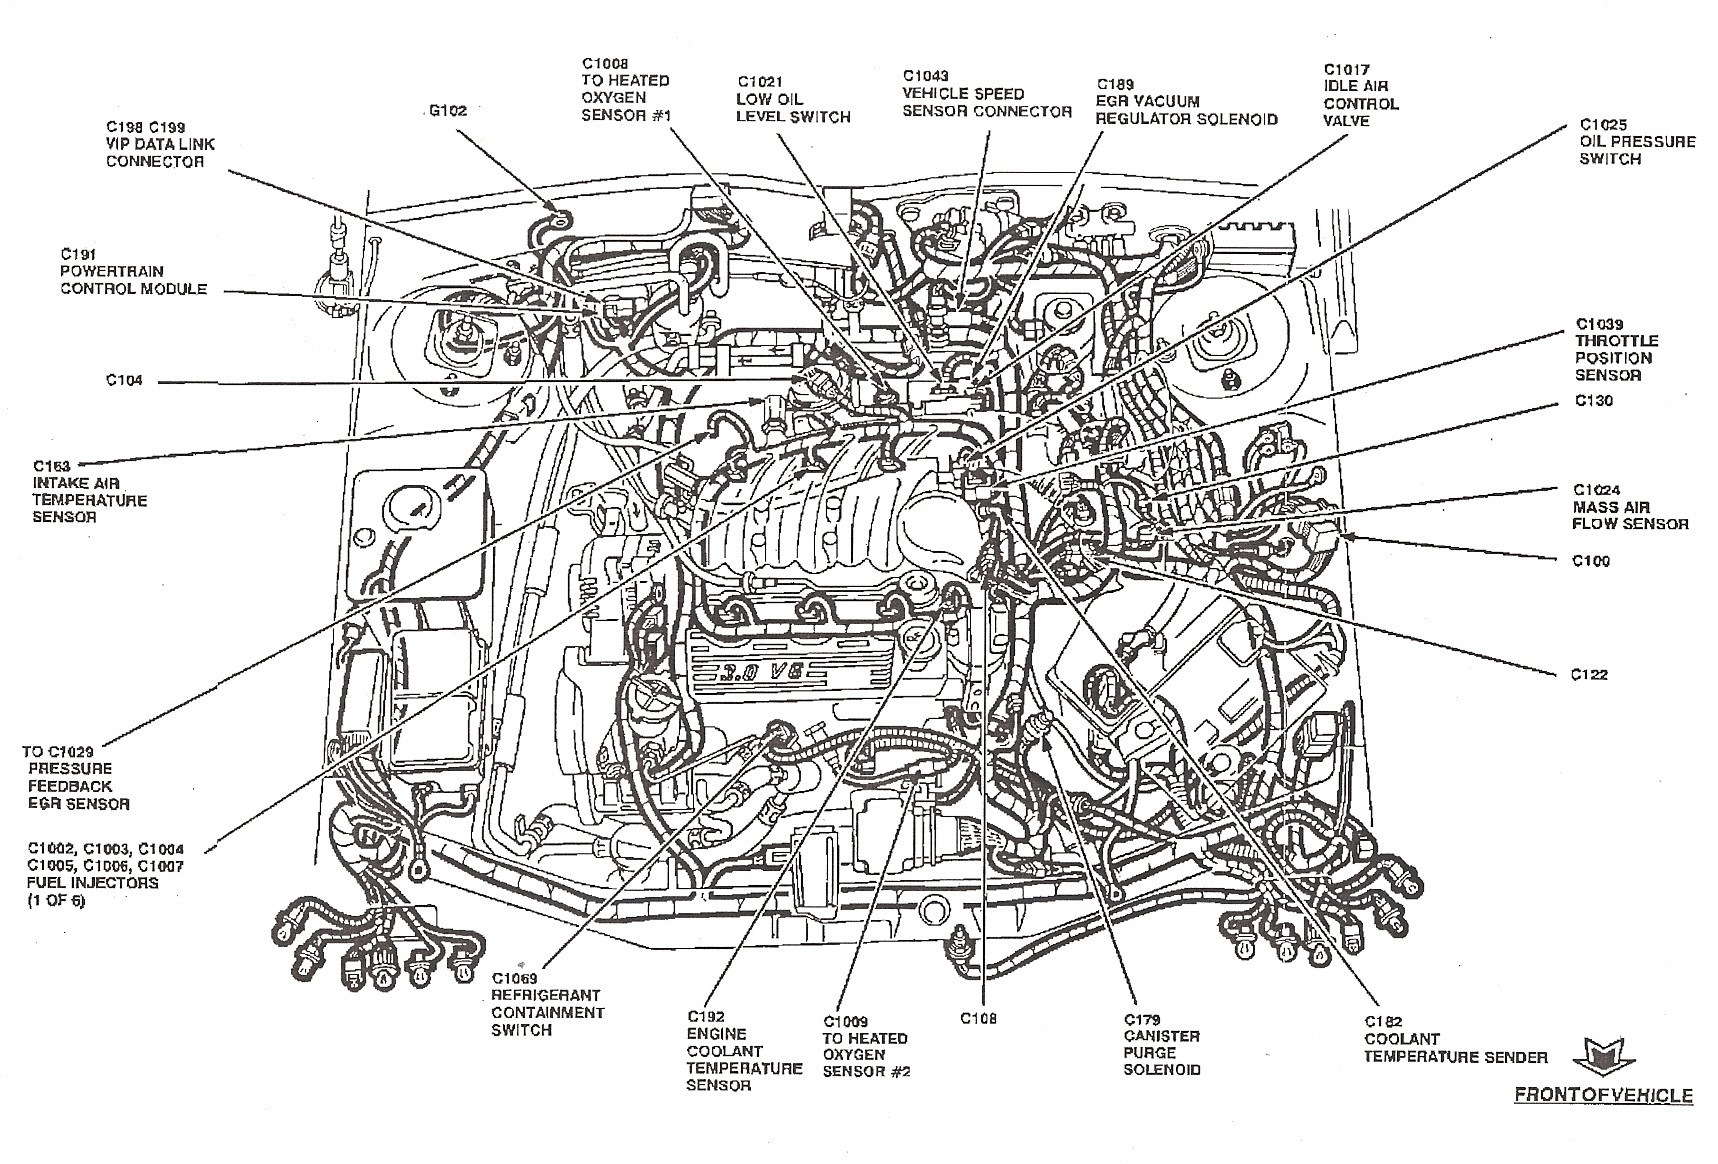 2013 ford Escape Engine Bay Diagram 1992 Escape Engine Diagram Wiring Diagrams Post Studio A